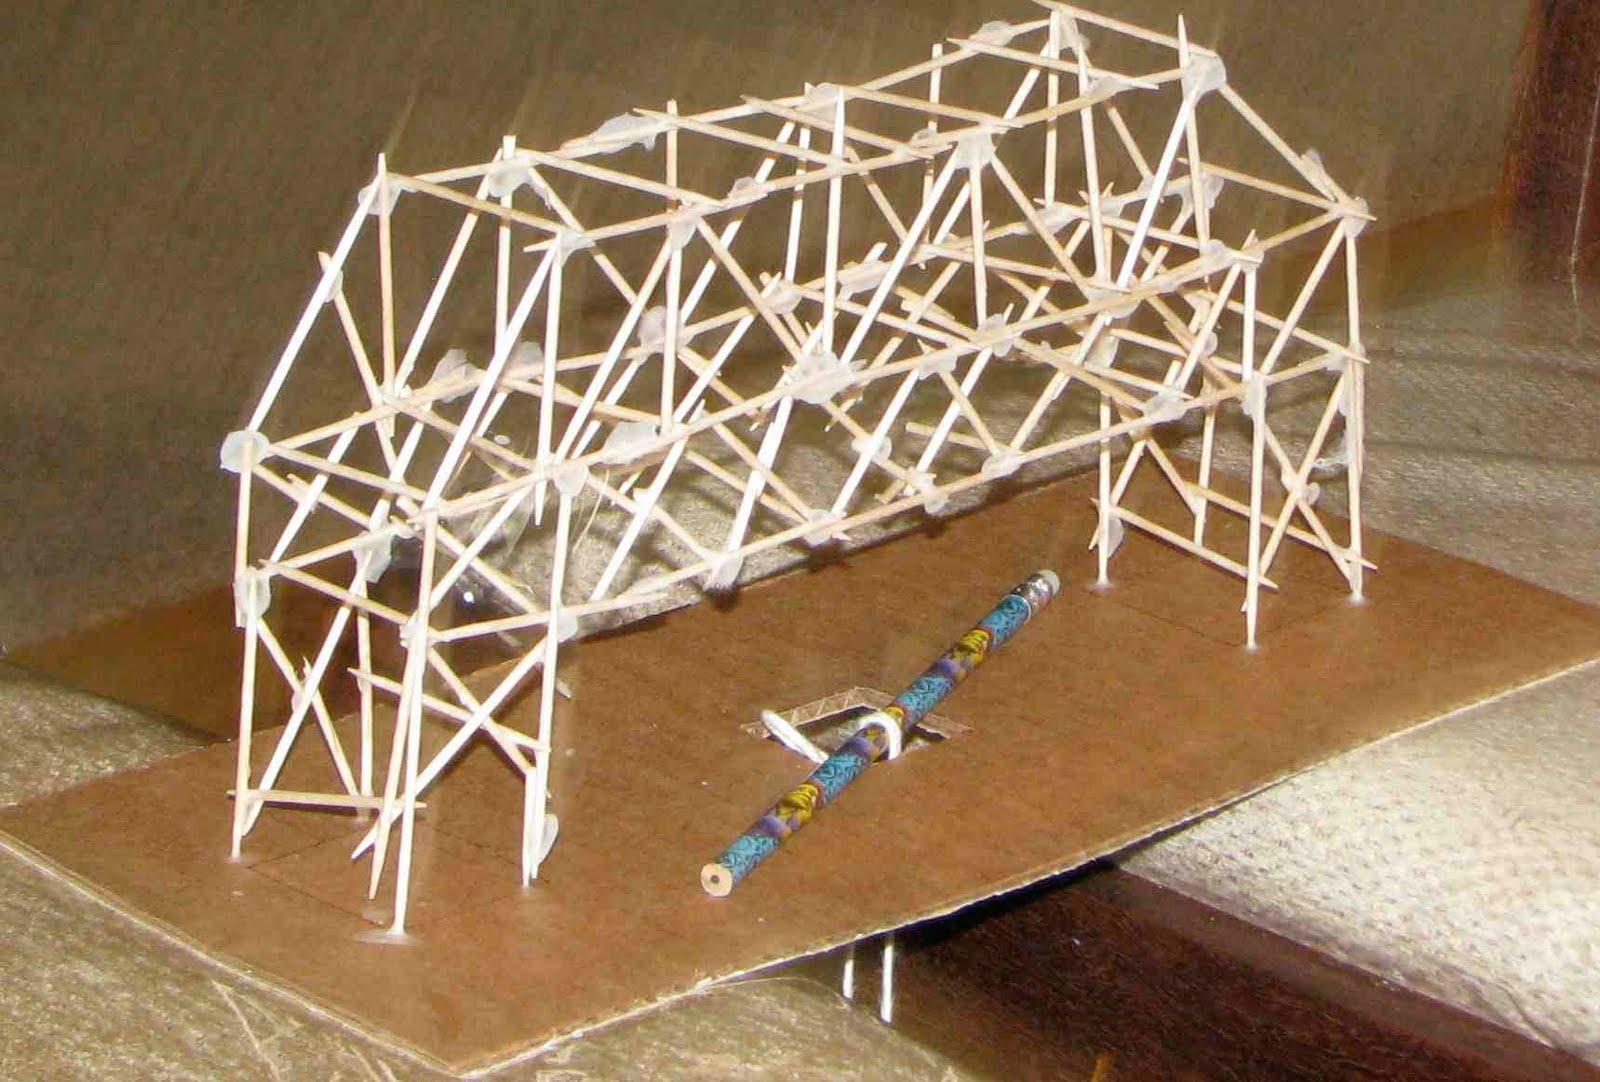 Building Toothpick Bridges A Lesson Plan Eva Varga